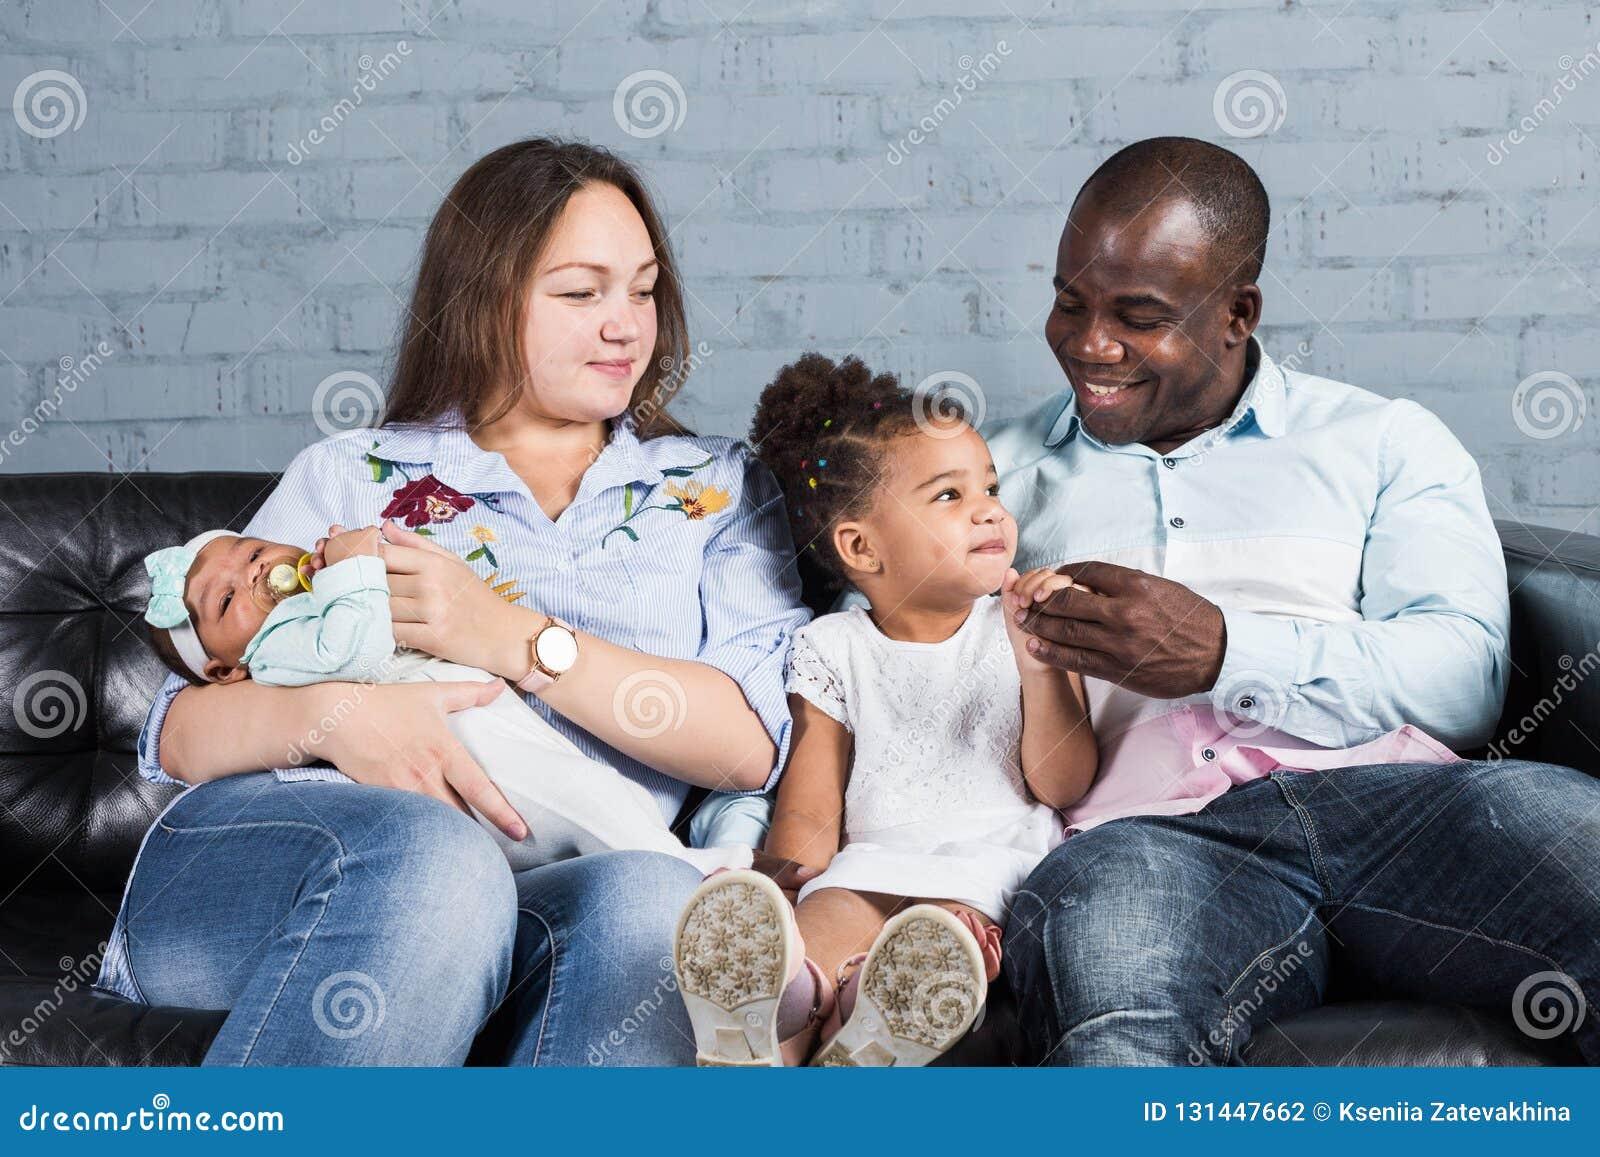 Happy multiethnic family sitting on the sofa in modern interior